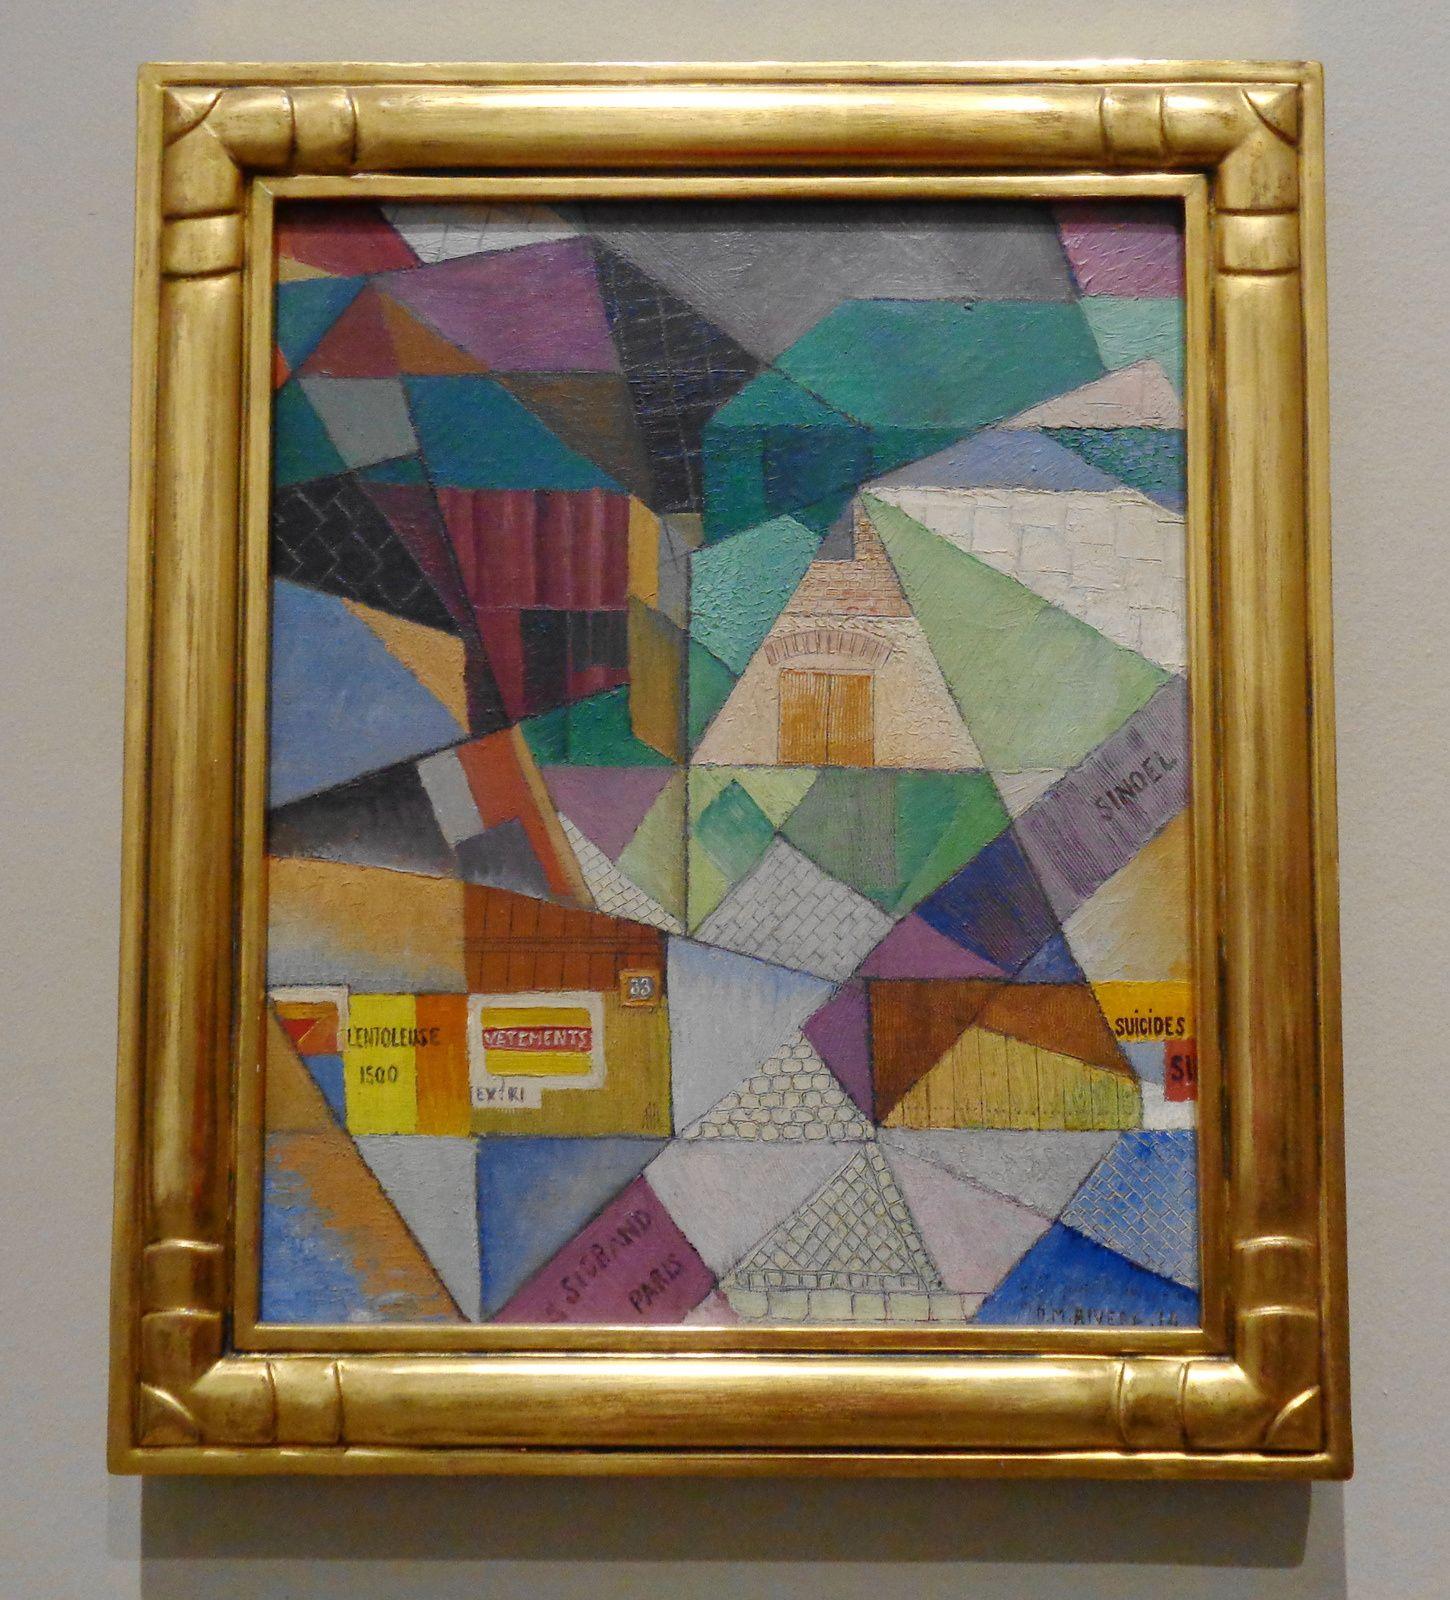 Toits de Paris - Diego Rivera, 1914